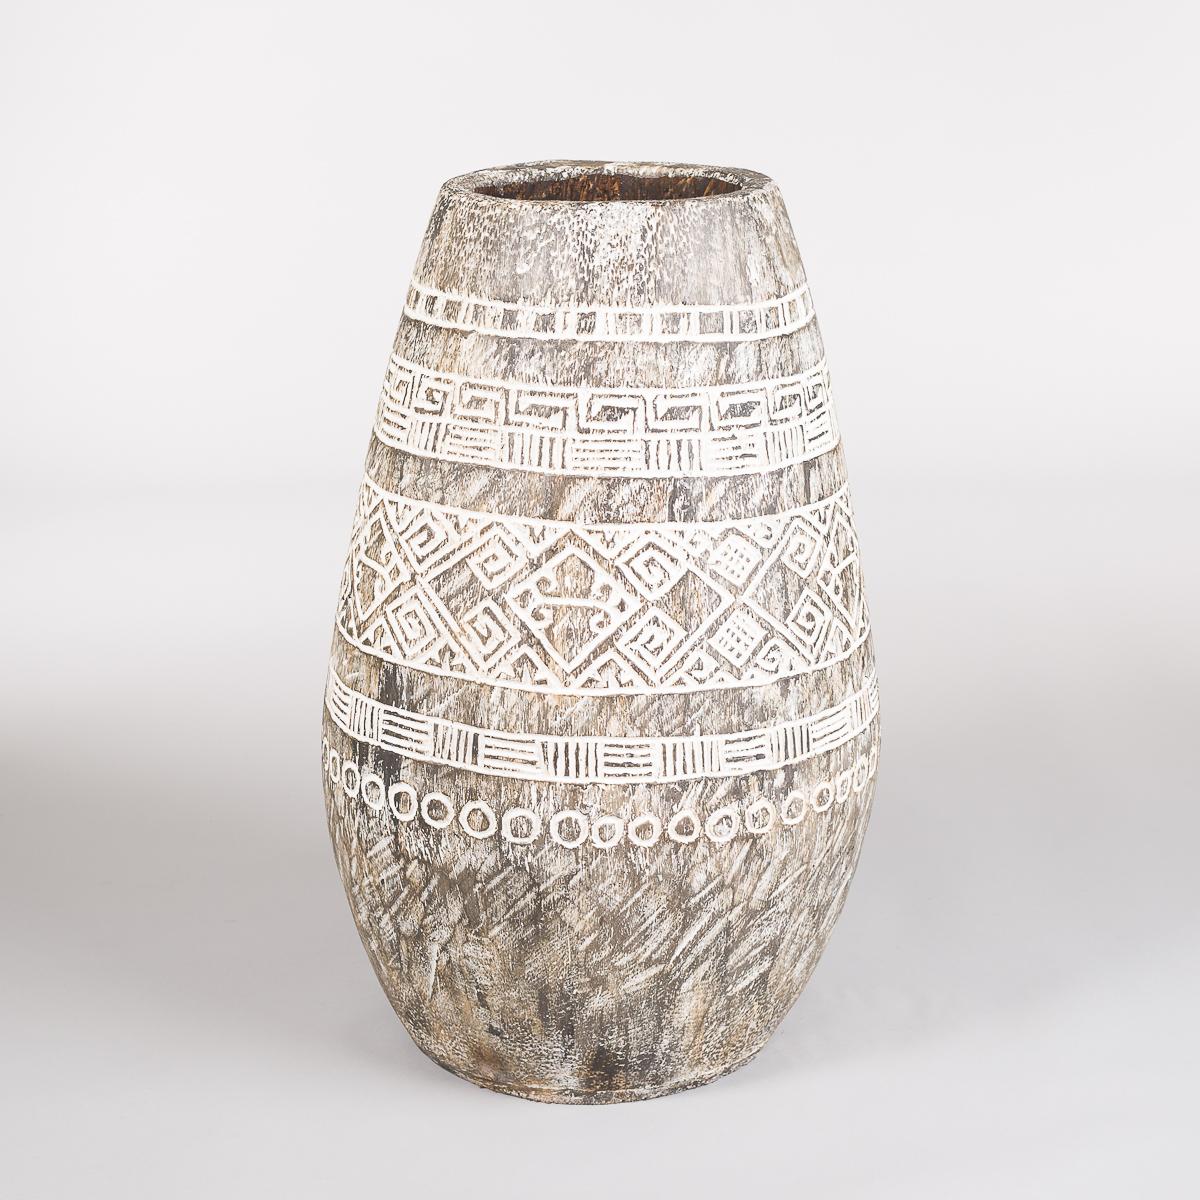 Palme potte, høyde 70 cm-0